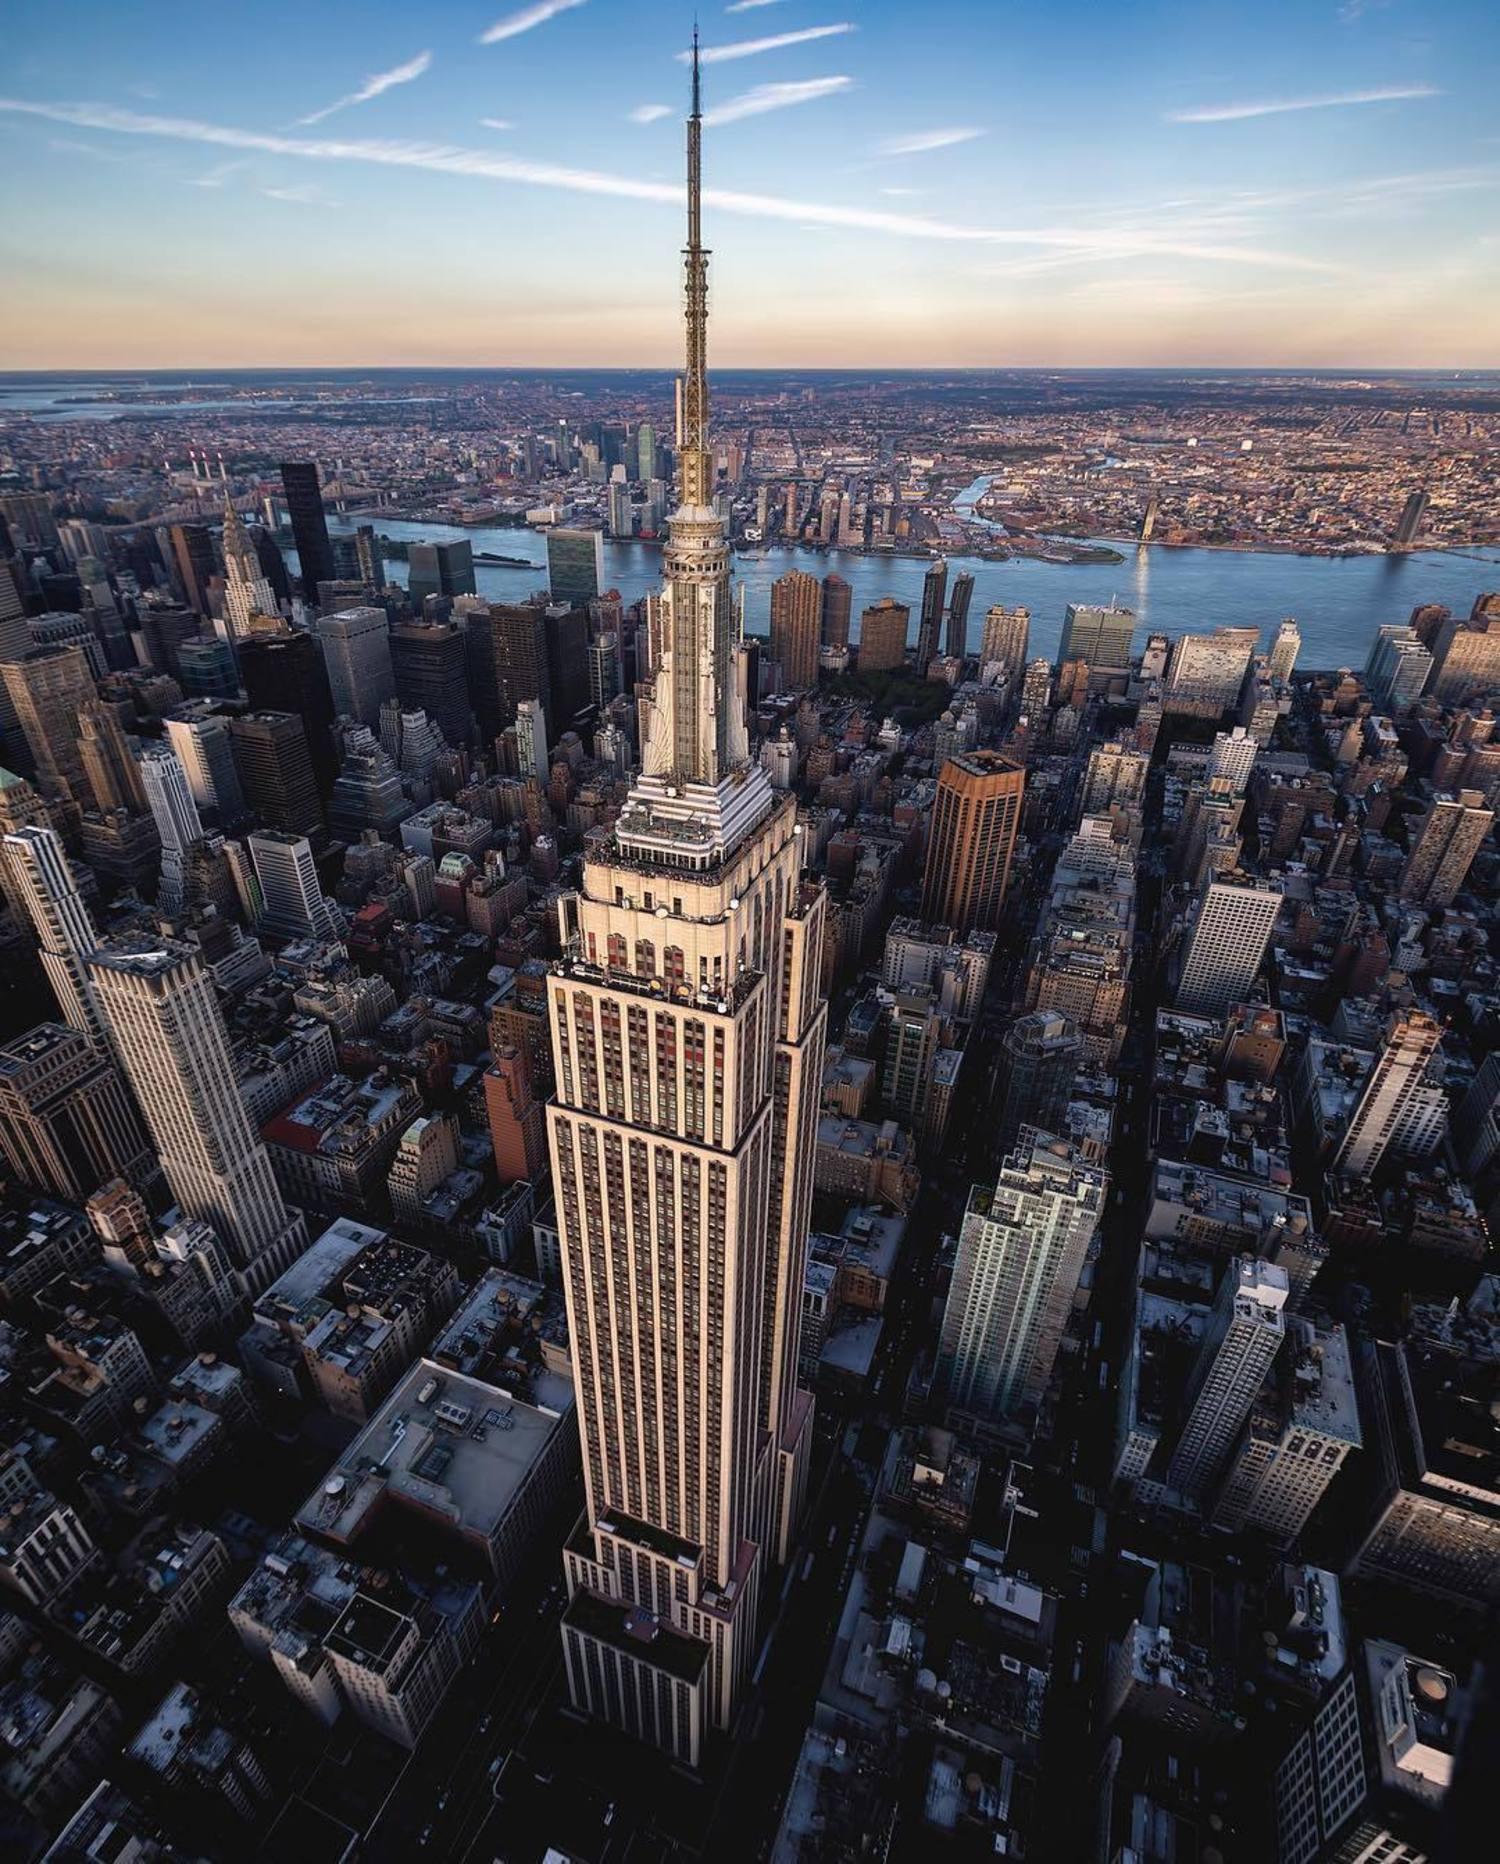 Empire State Building, New York, New York. Photo via @beholdingeye #viewingnyc #nyc #newyorkcity #newyork #empirestatebuilding